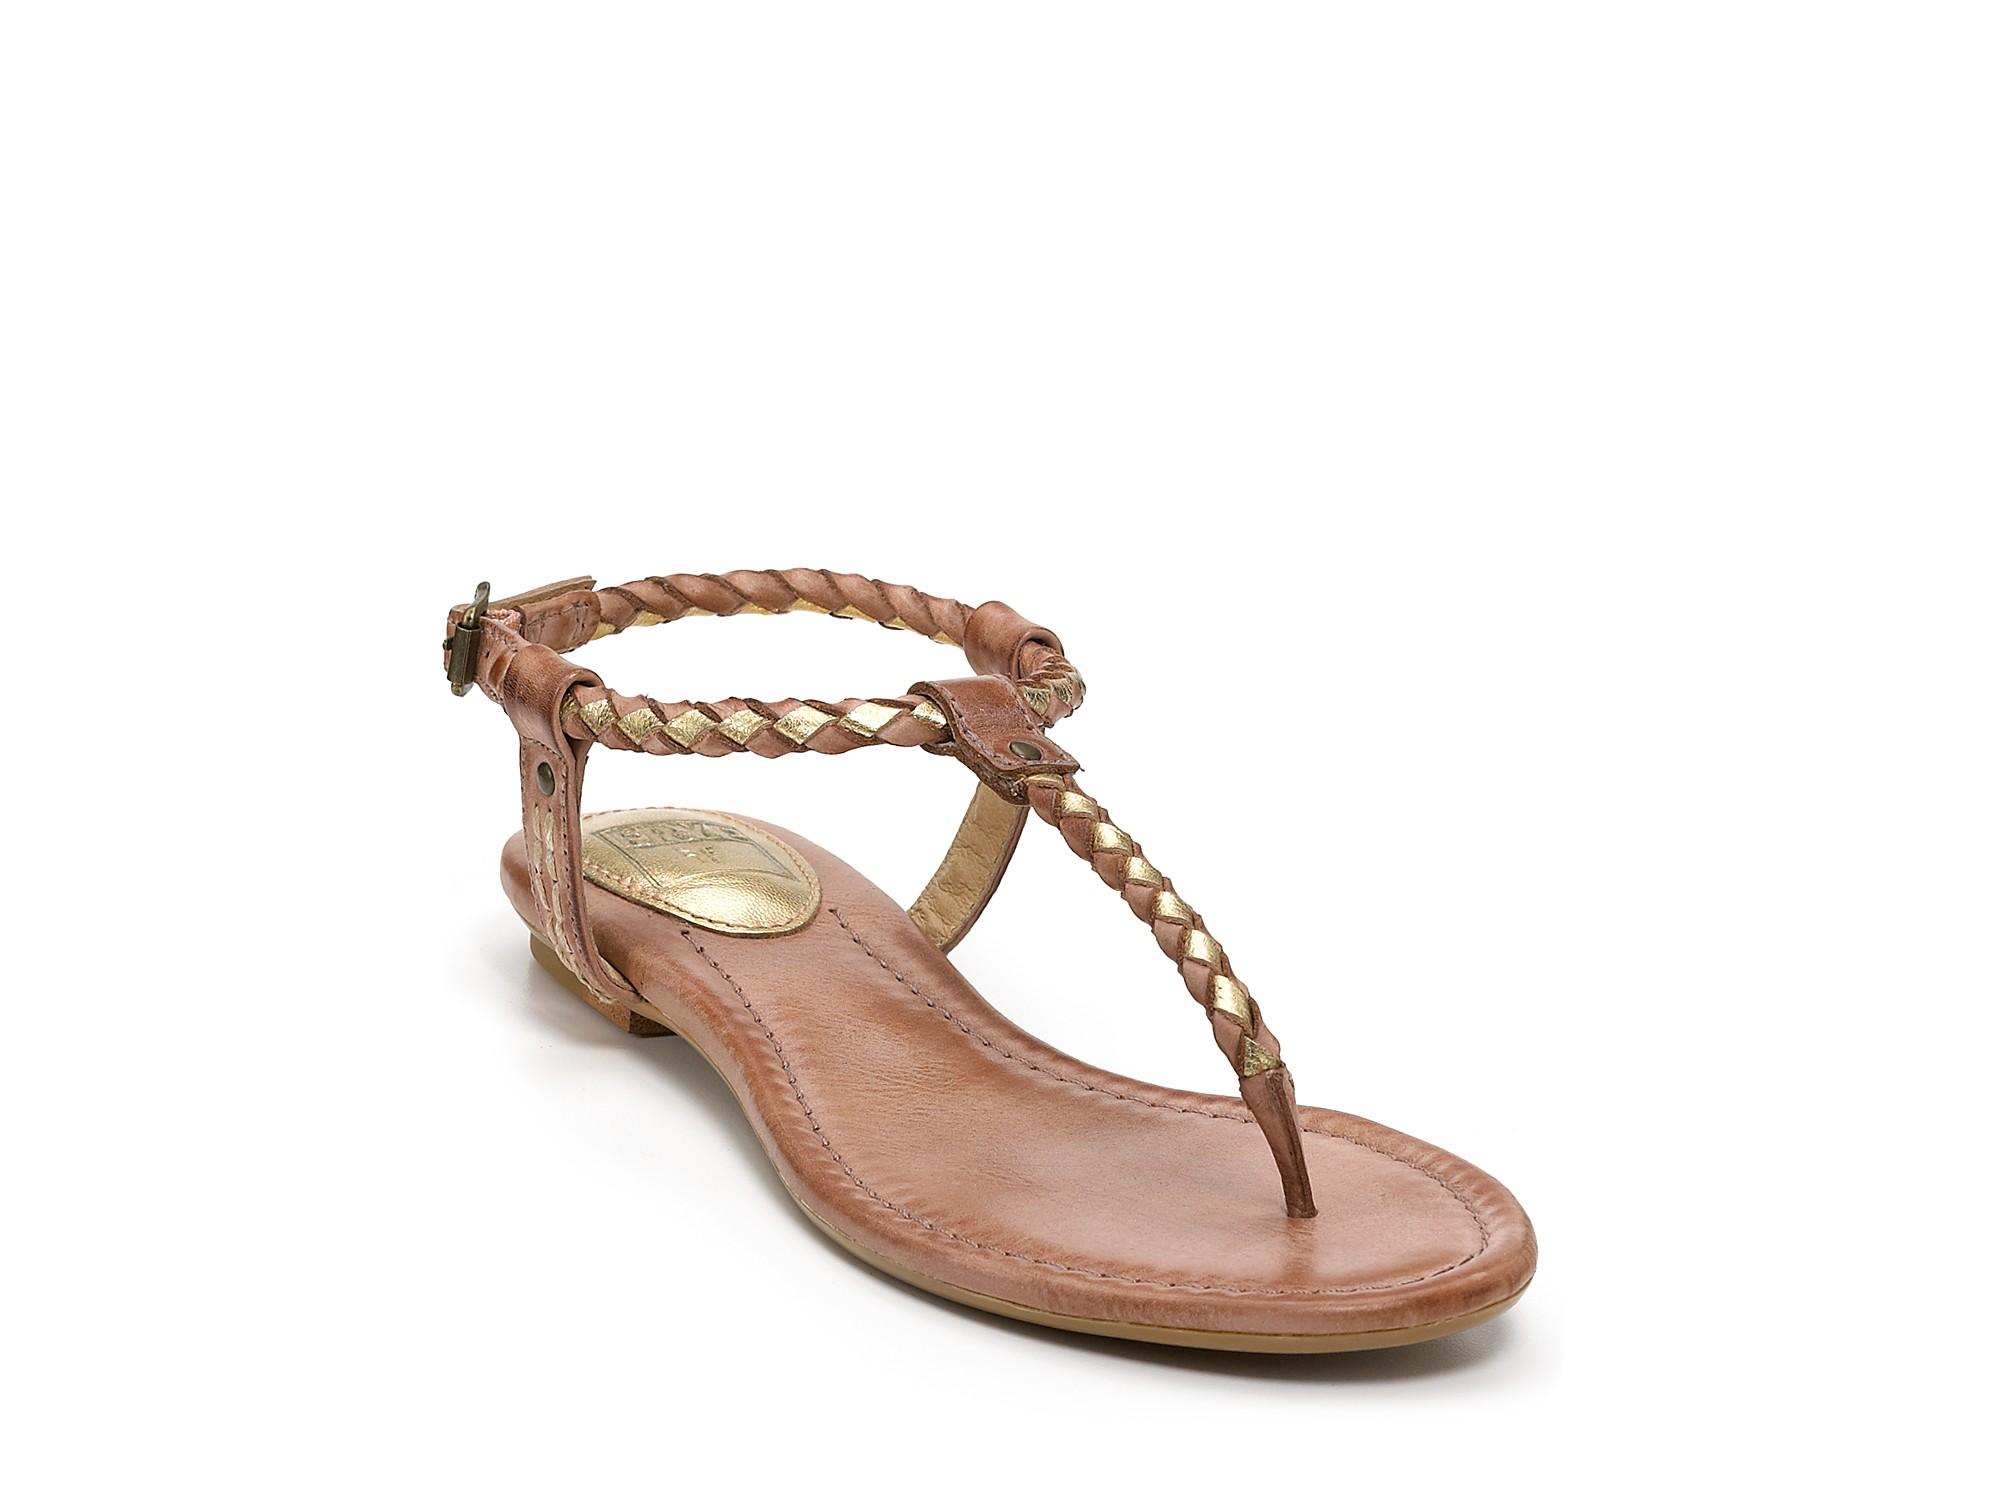 Frye Sandals Madison Braided Flat In Metallic Lyst